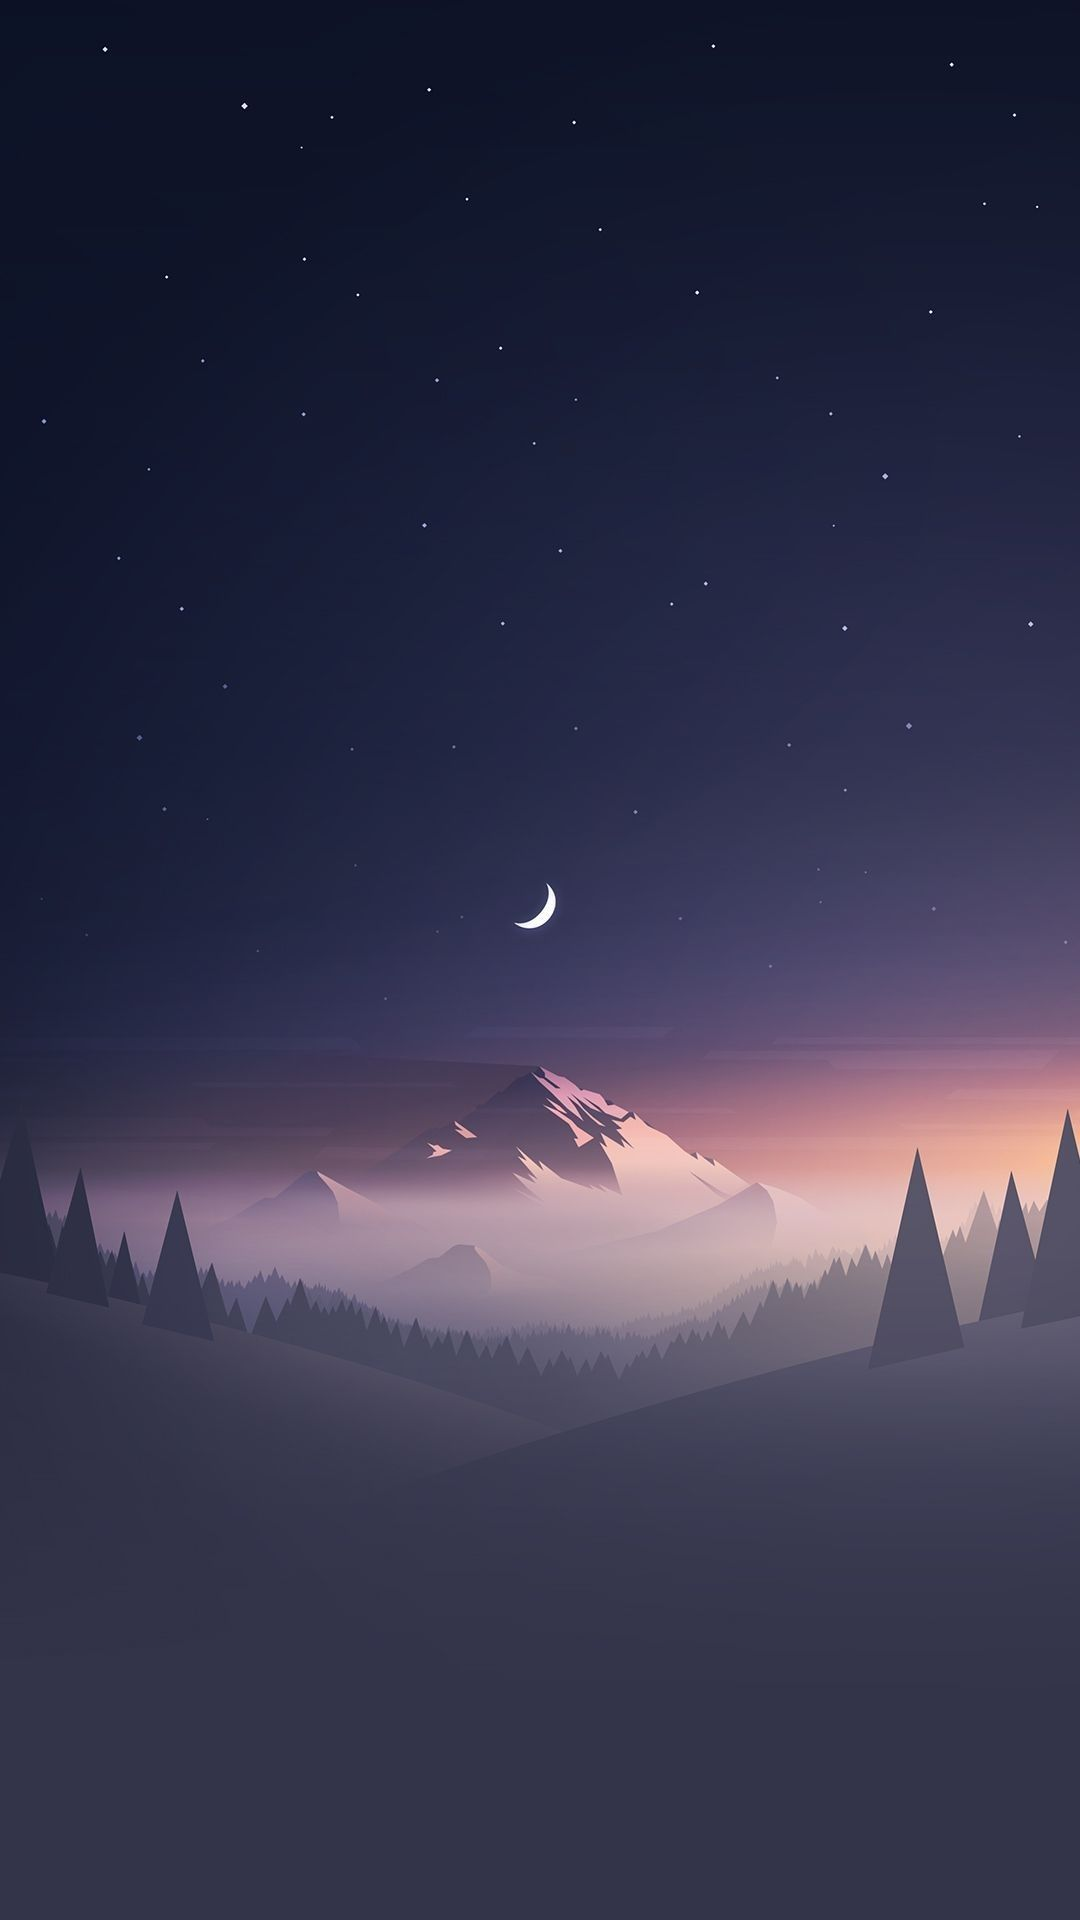 Blacknight Art Created By Sezai Kartal